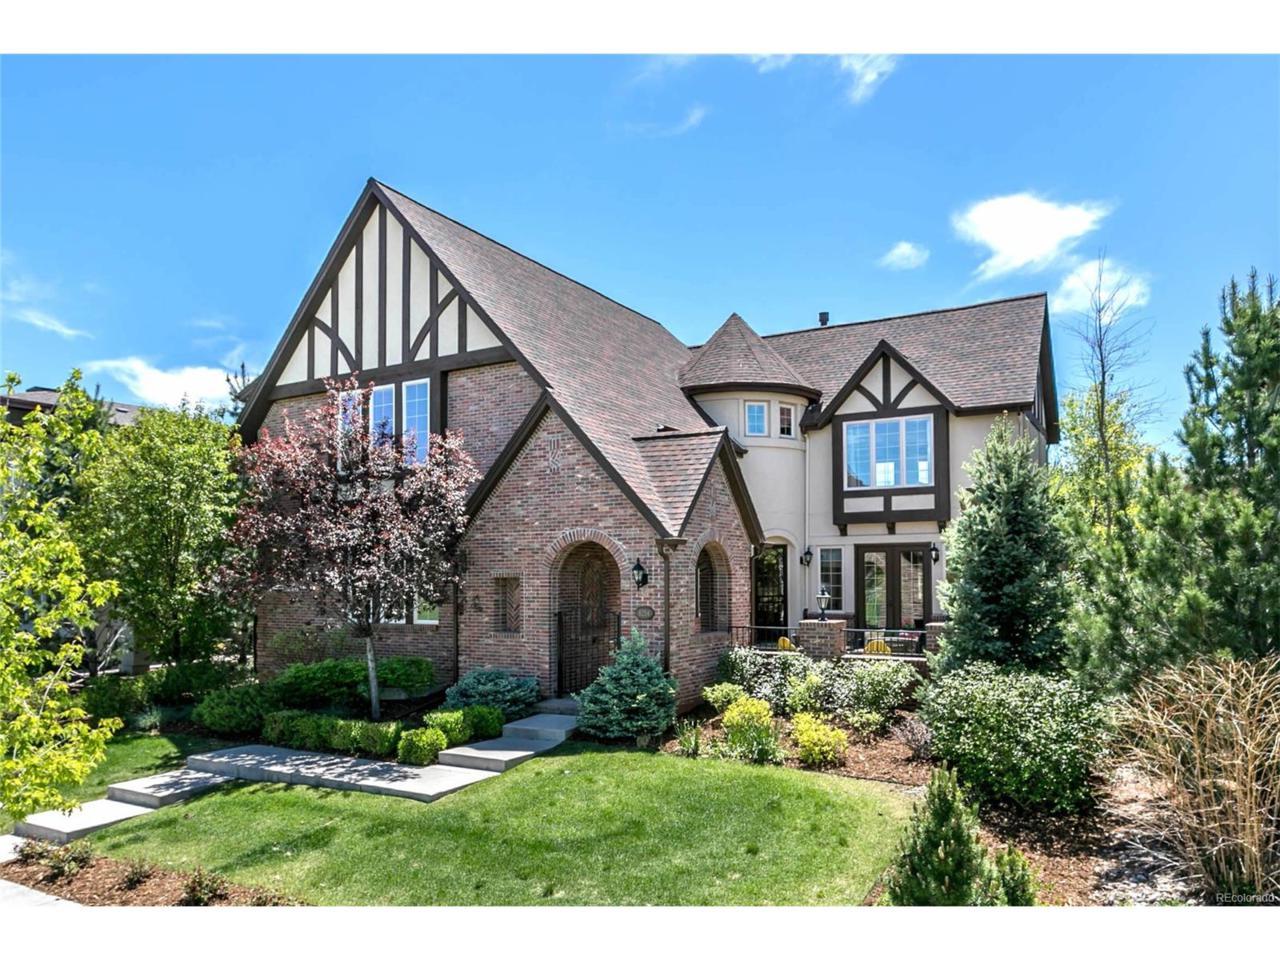 8254 E 25th Drive, Denver, CO 80238 (MLS #3529209) :: 8z Real Estate